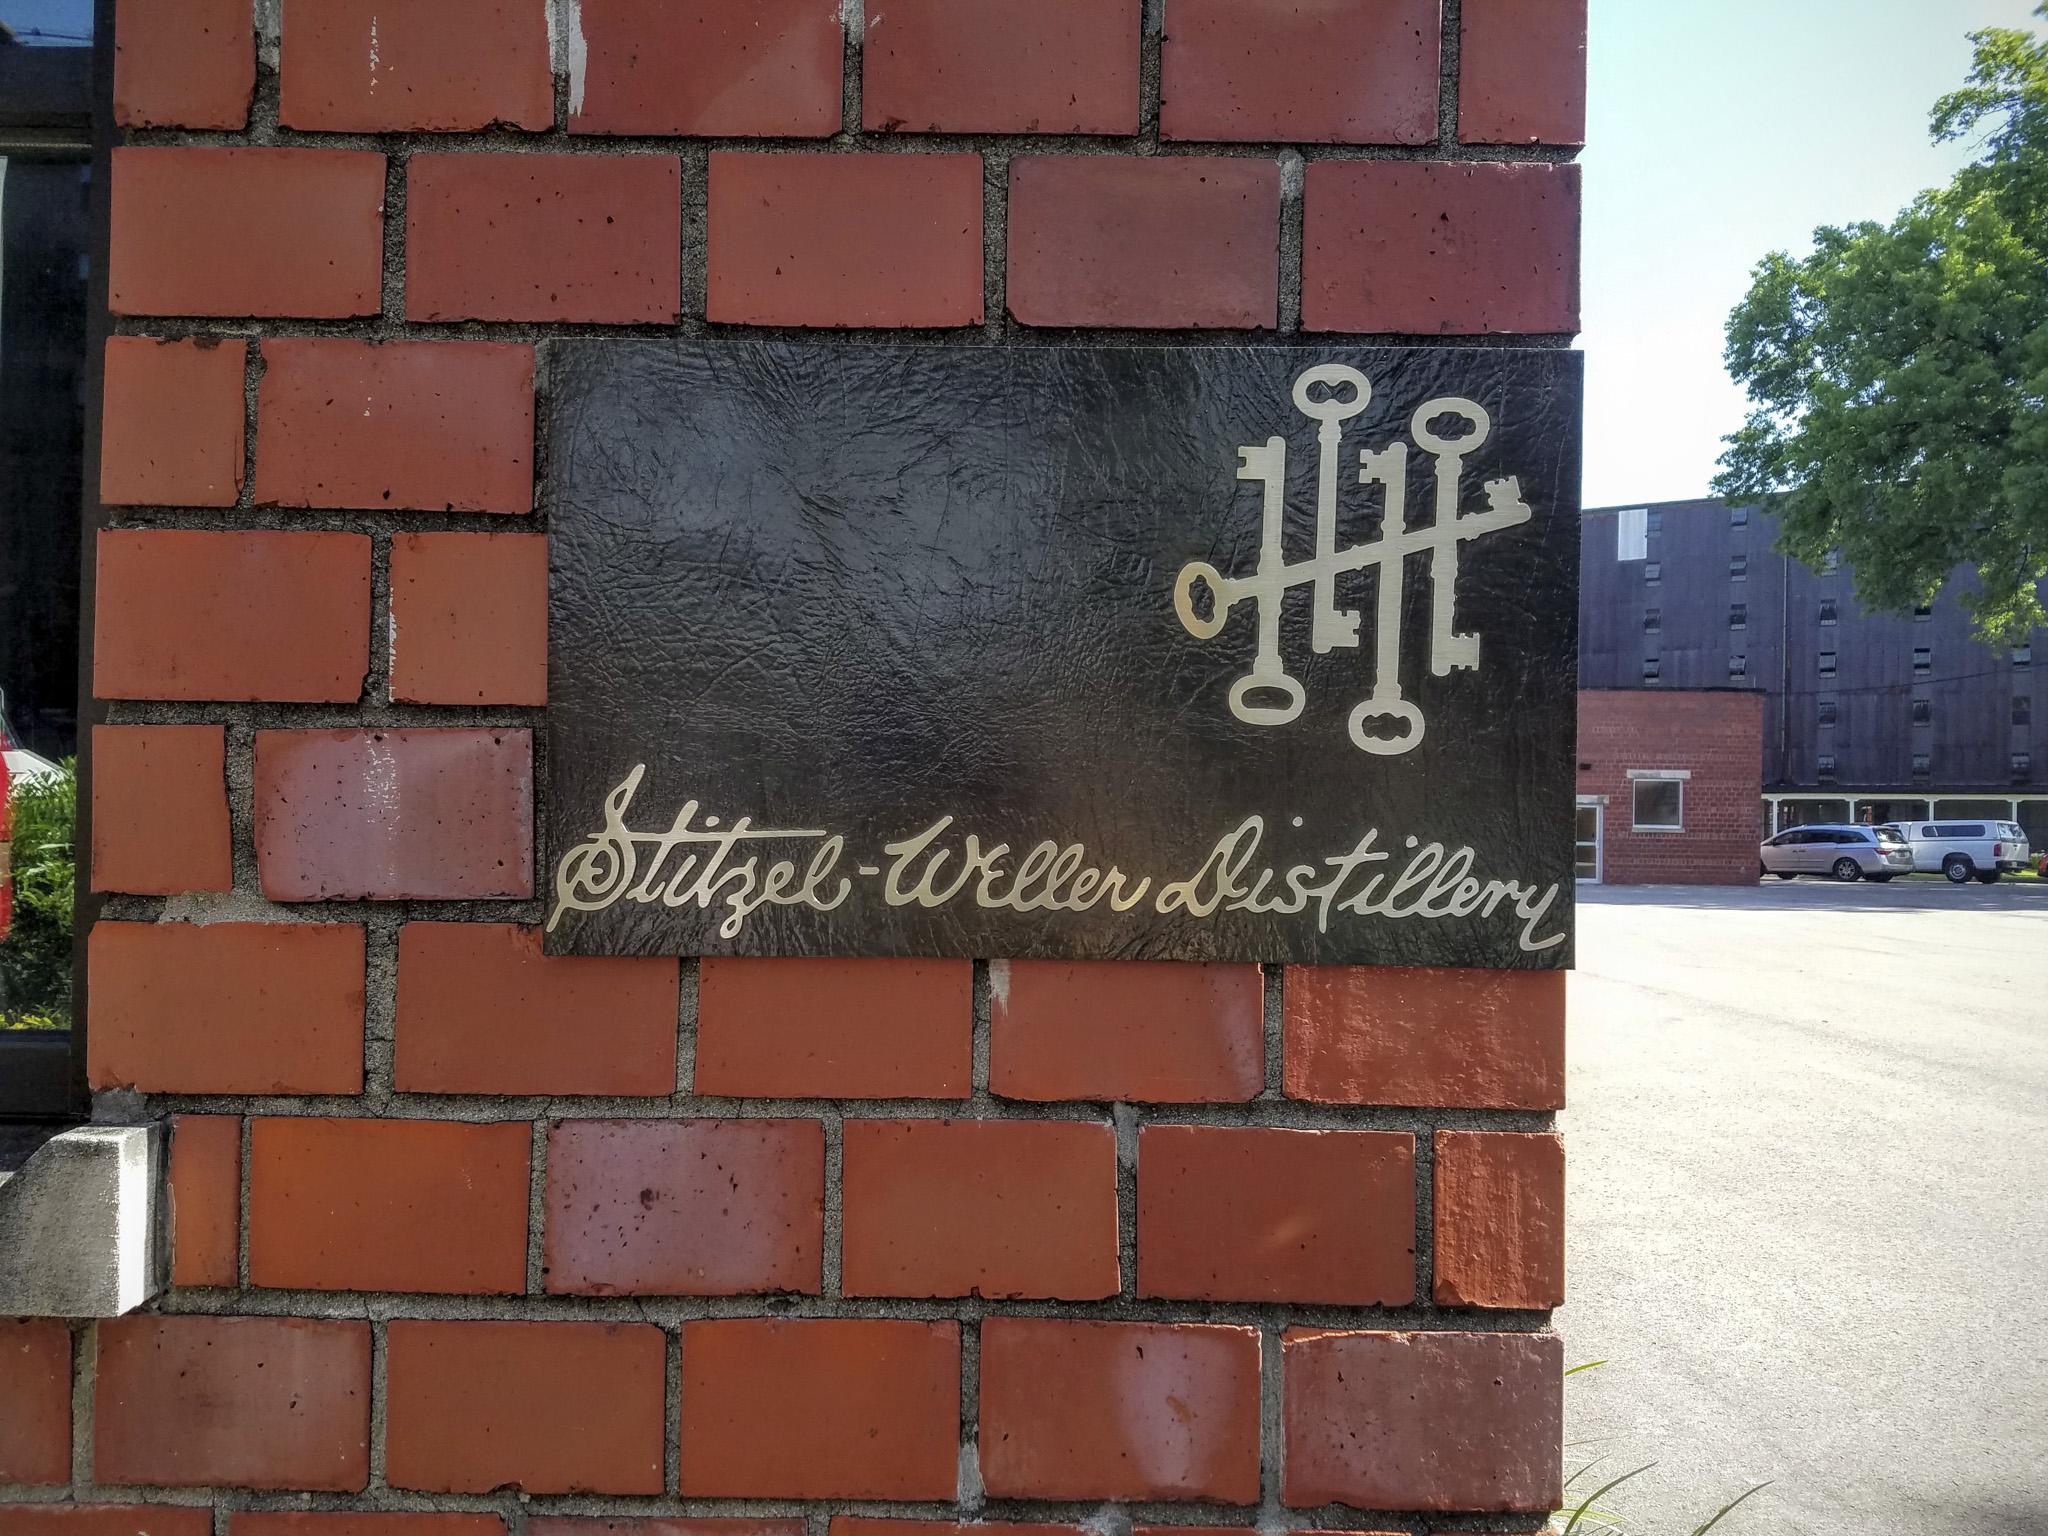 Stitzel-Weller Distillery sign